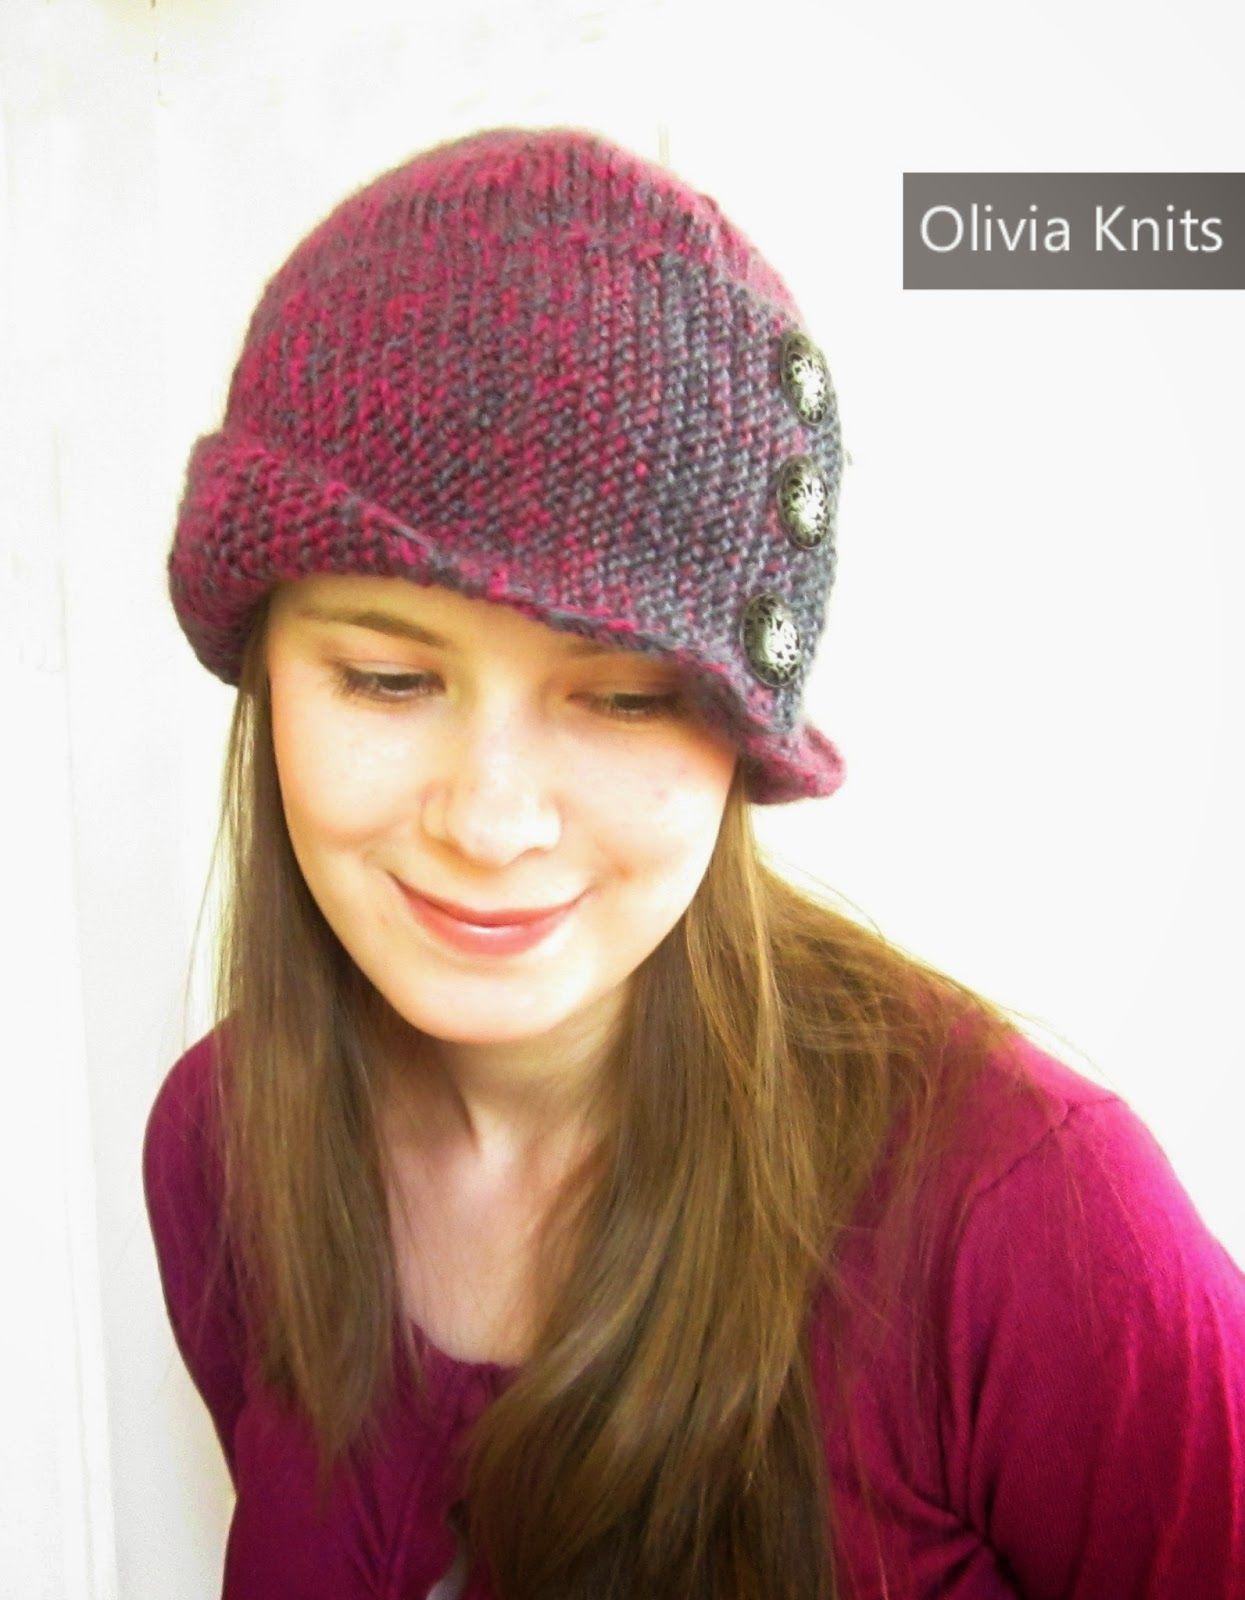 bca5558e88d Knitting Blog | Olivia Knit Design | Шапочка, Вязание и Робин